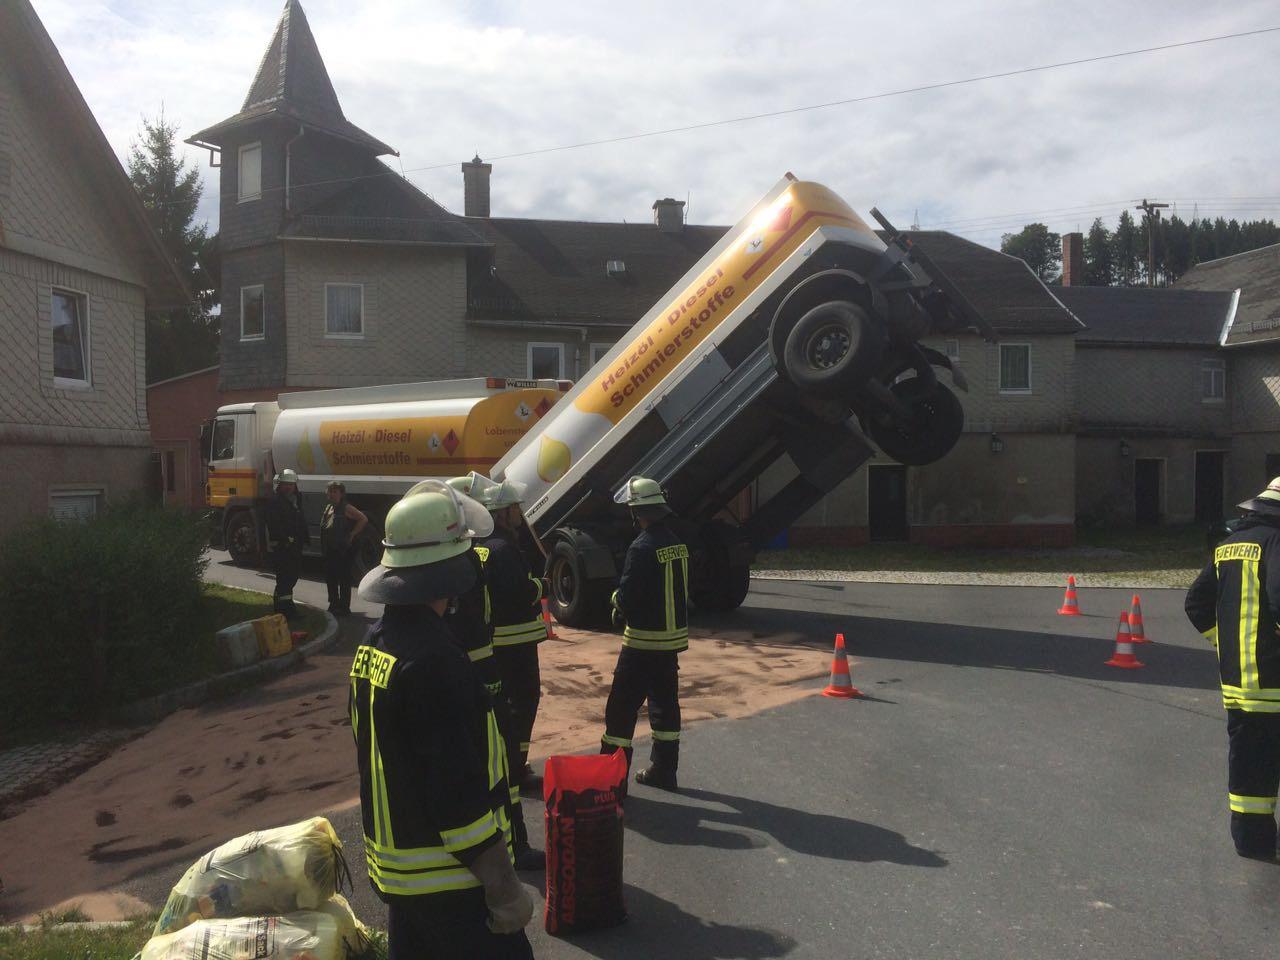 Verkehrsunfall mit Tanklastzug